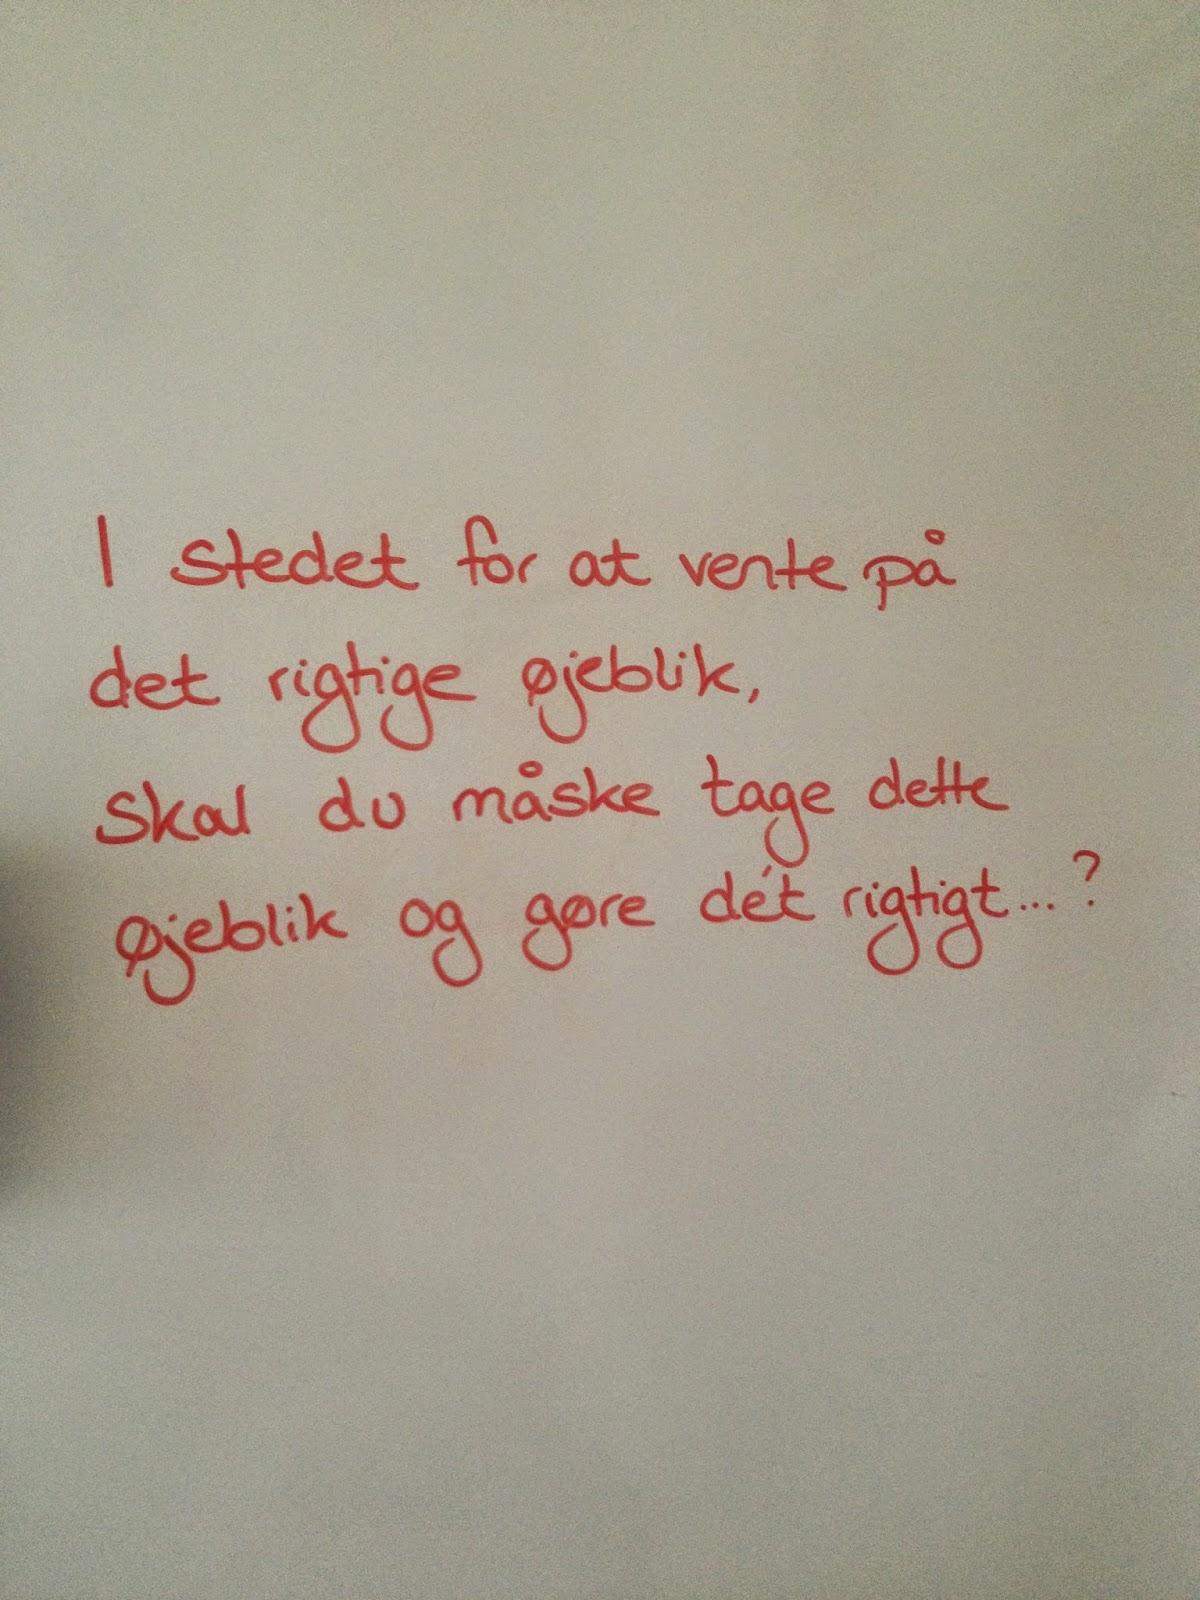 citater om facade Resten skal nydes!: september 2014 citater om facade